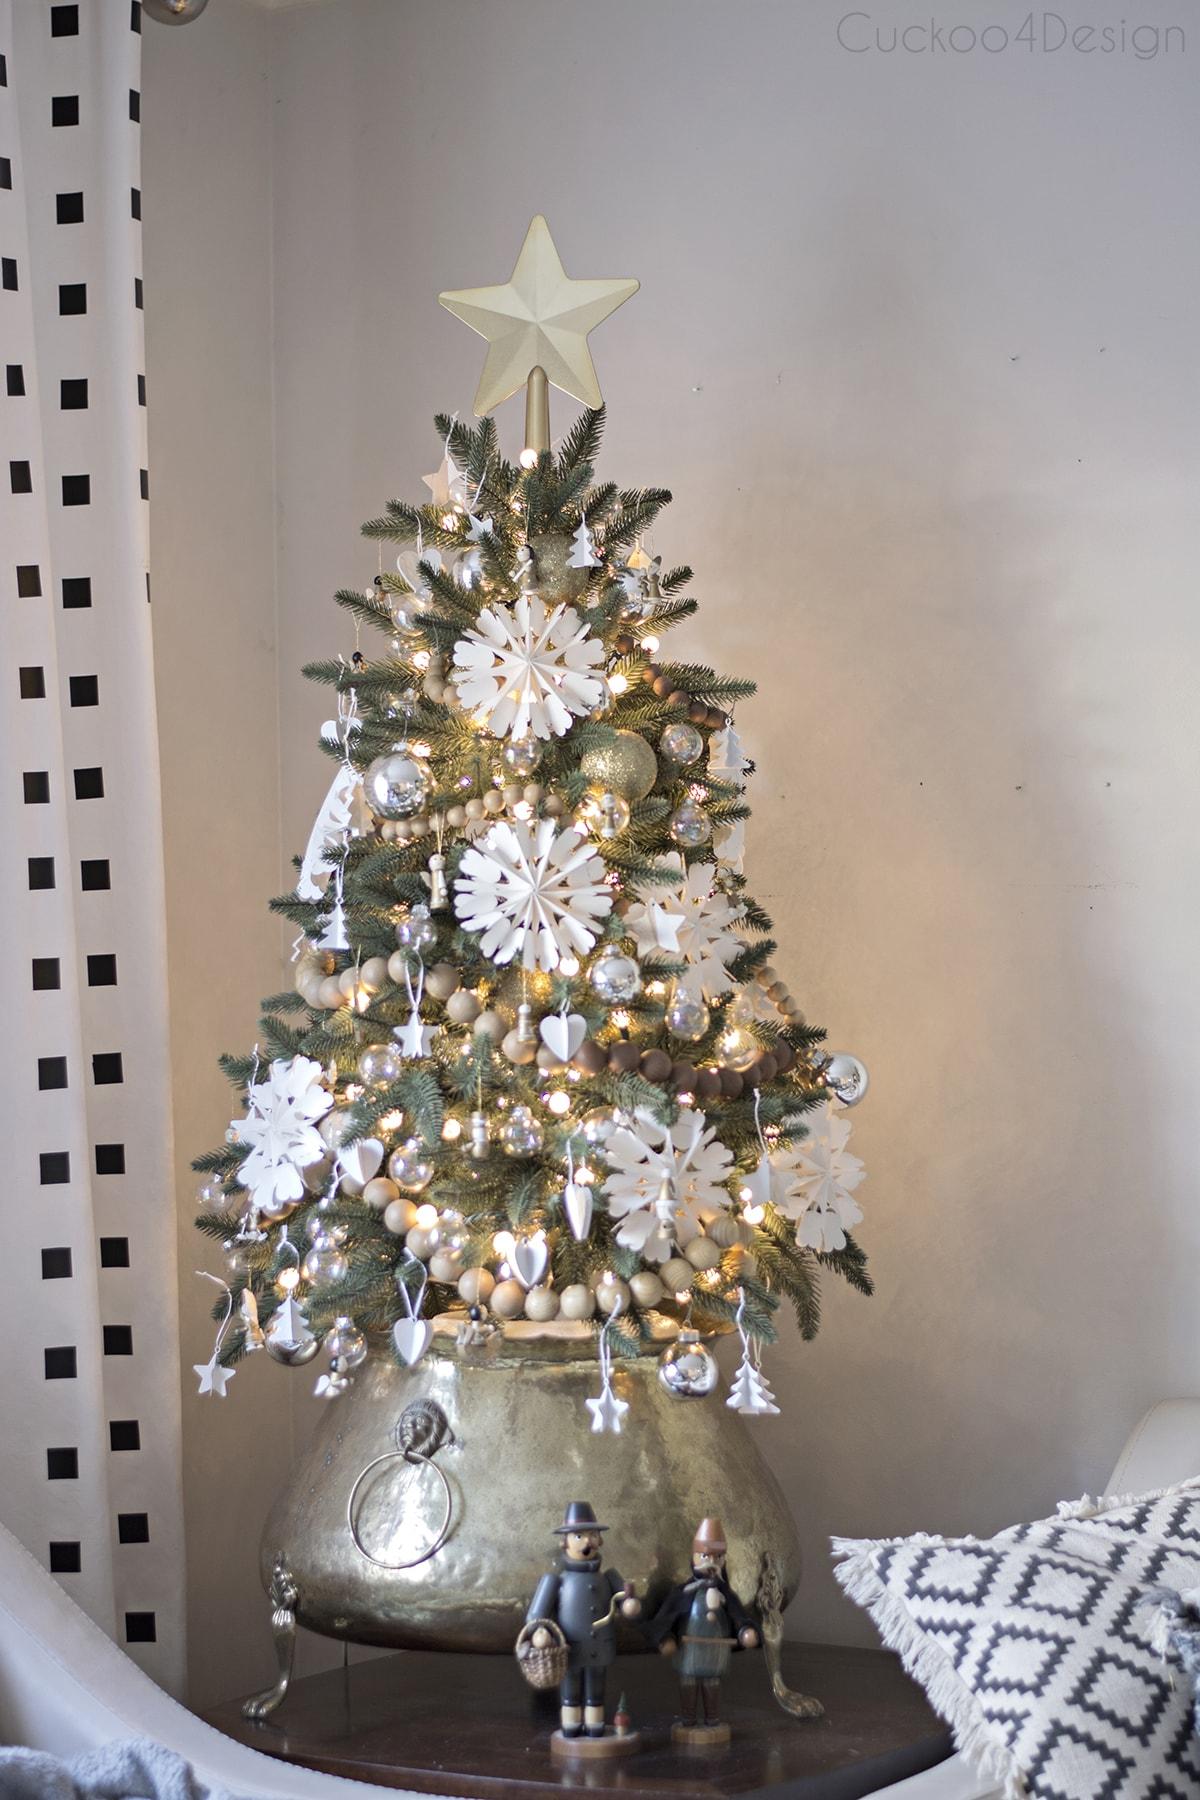 Friday Favorites: German Christmas Decorations | Cuckoo4Design